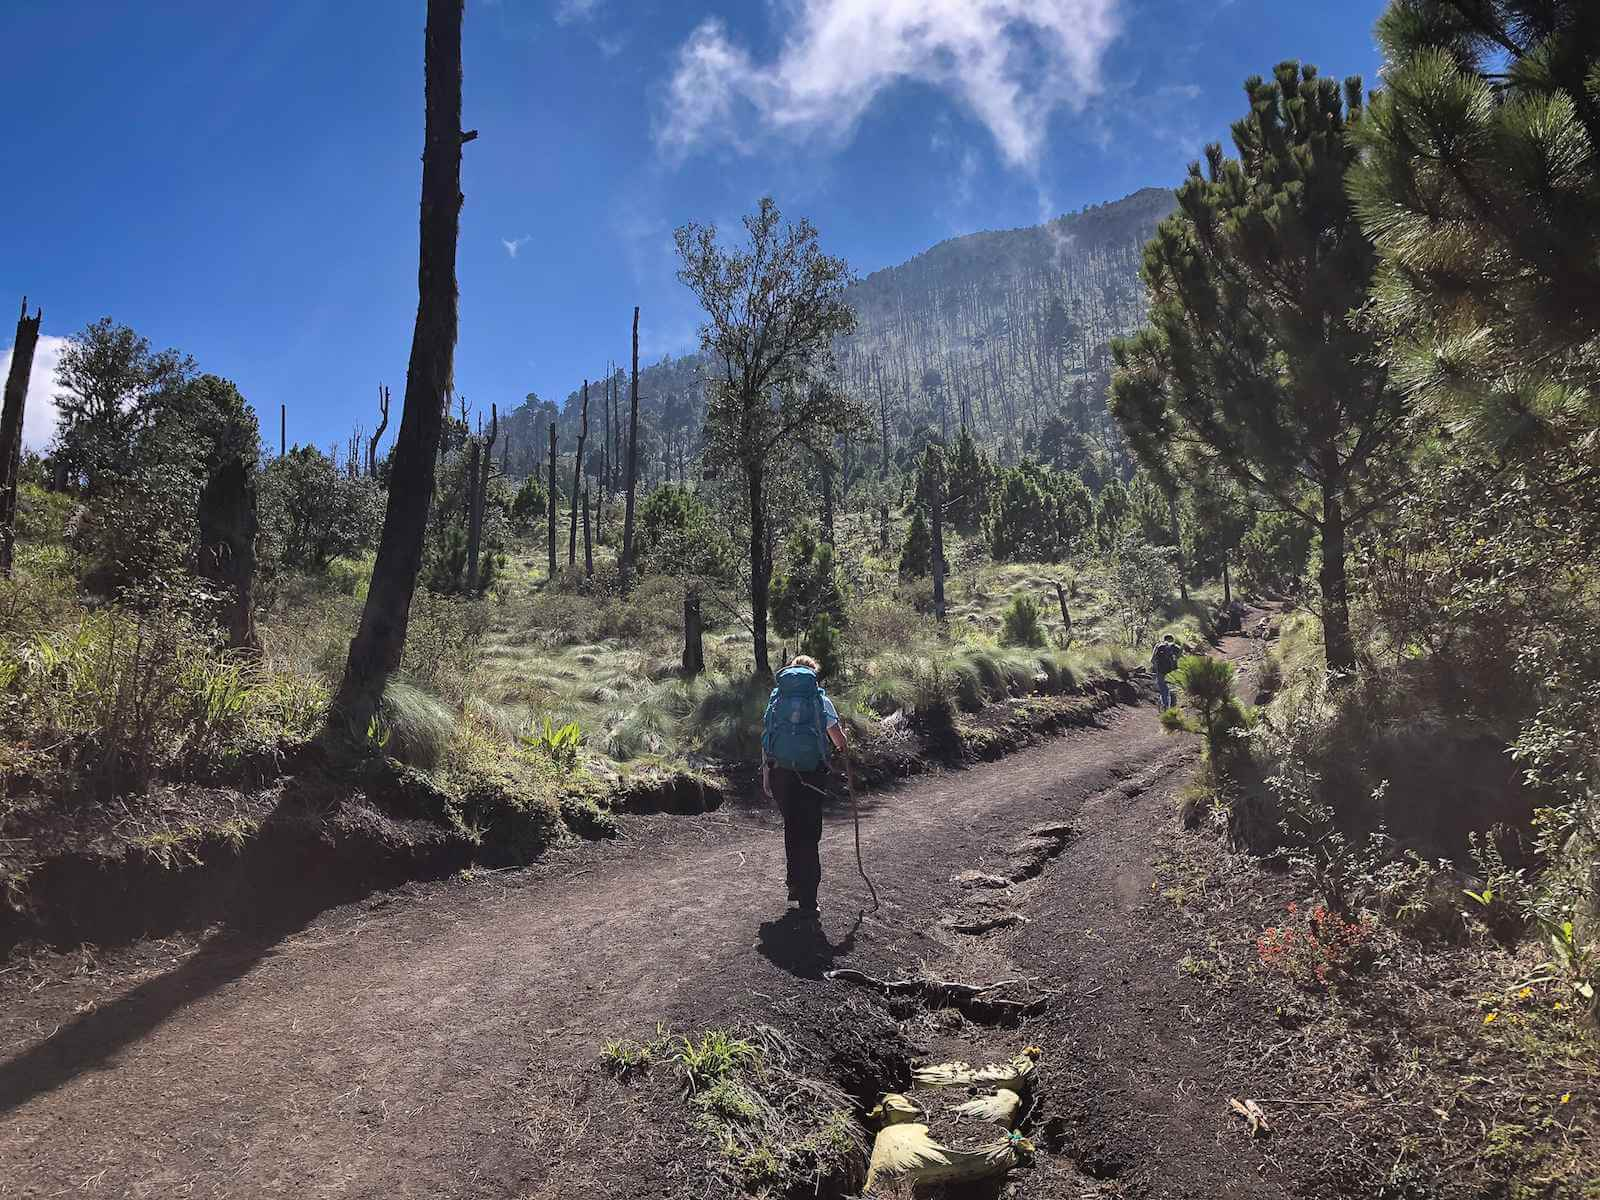 Acatenango Vulkaan beklimmen - de hike